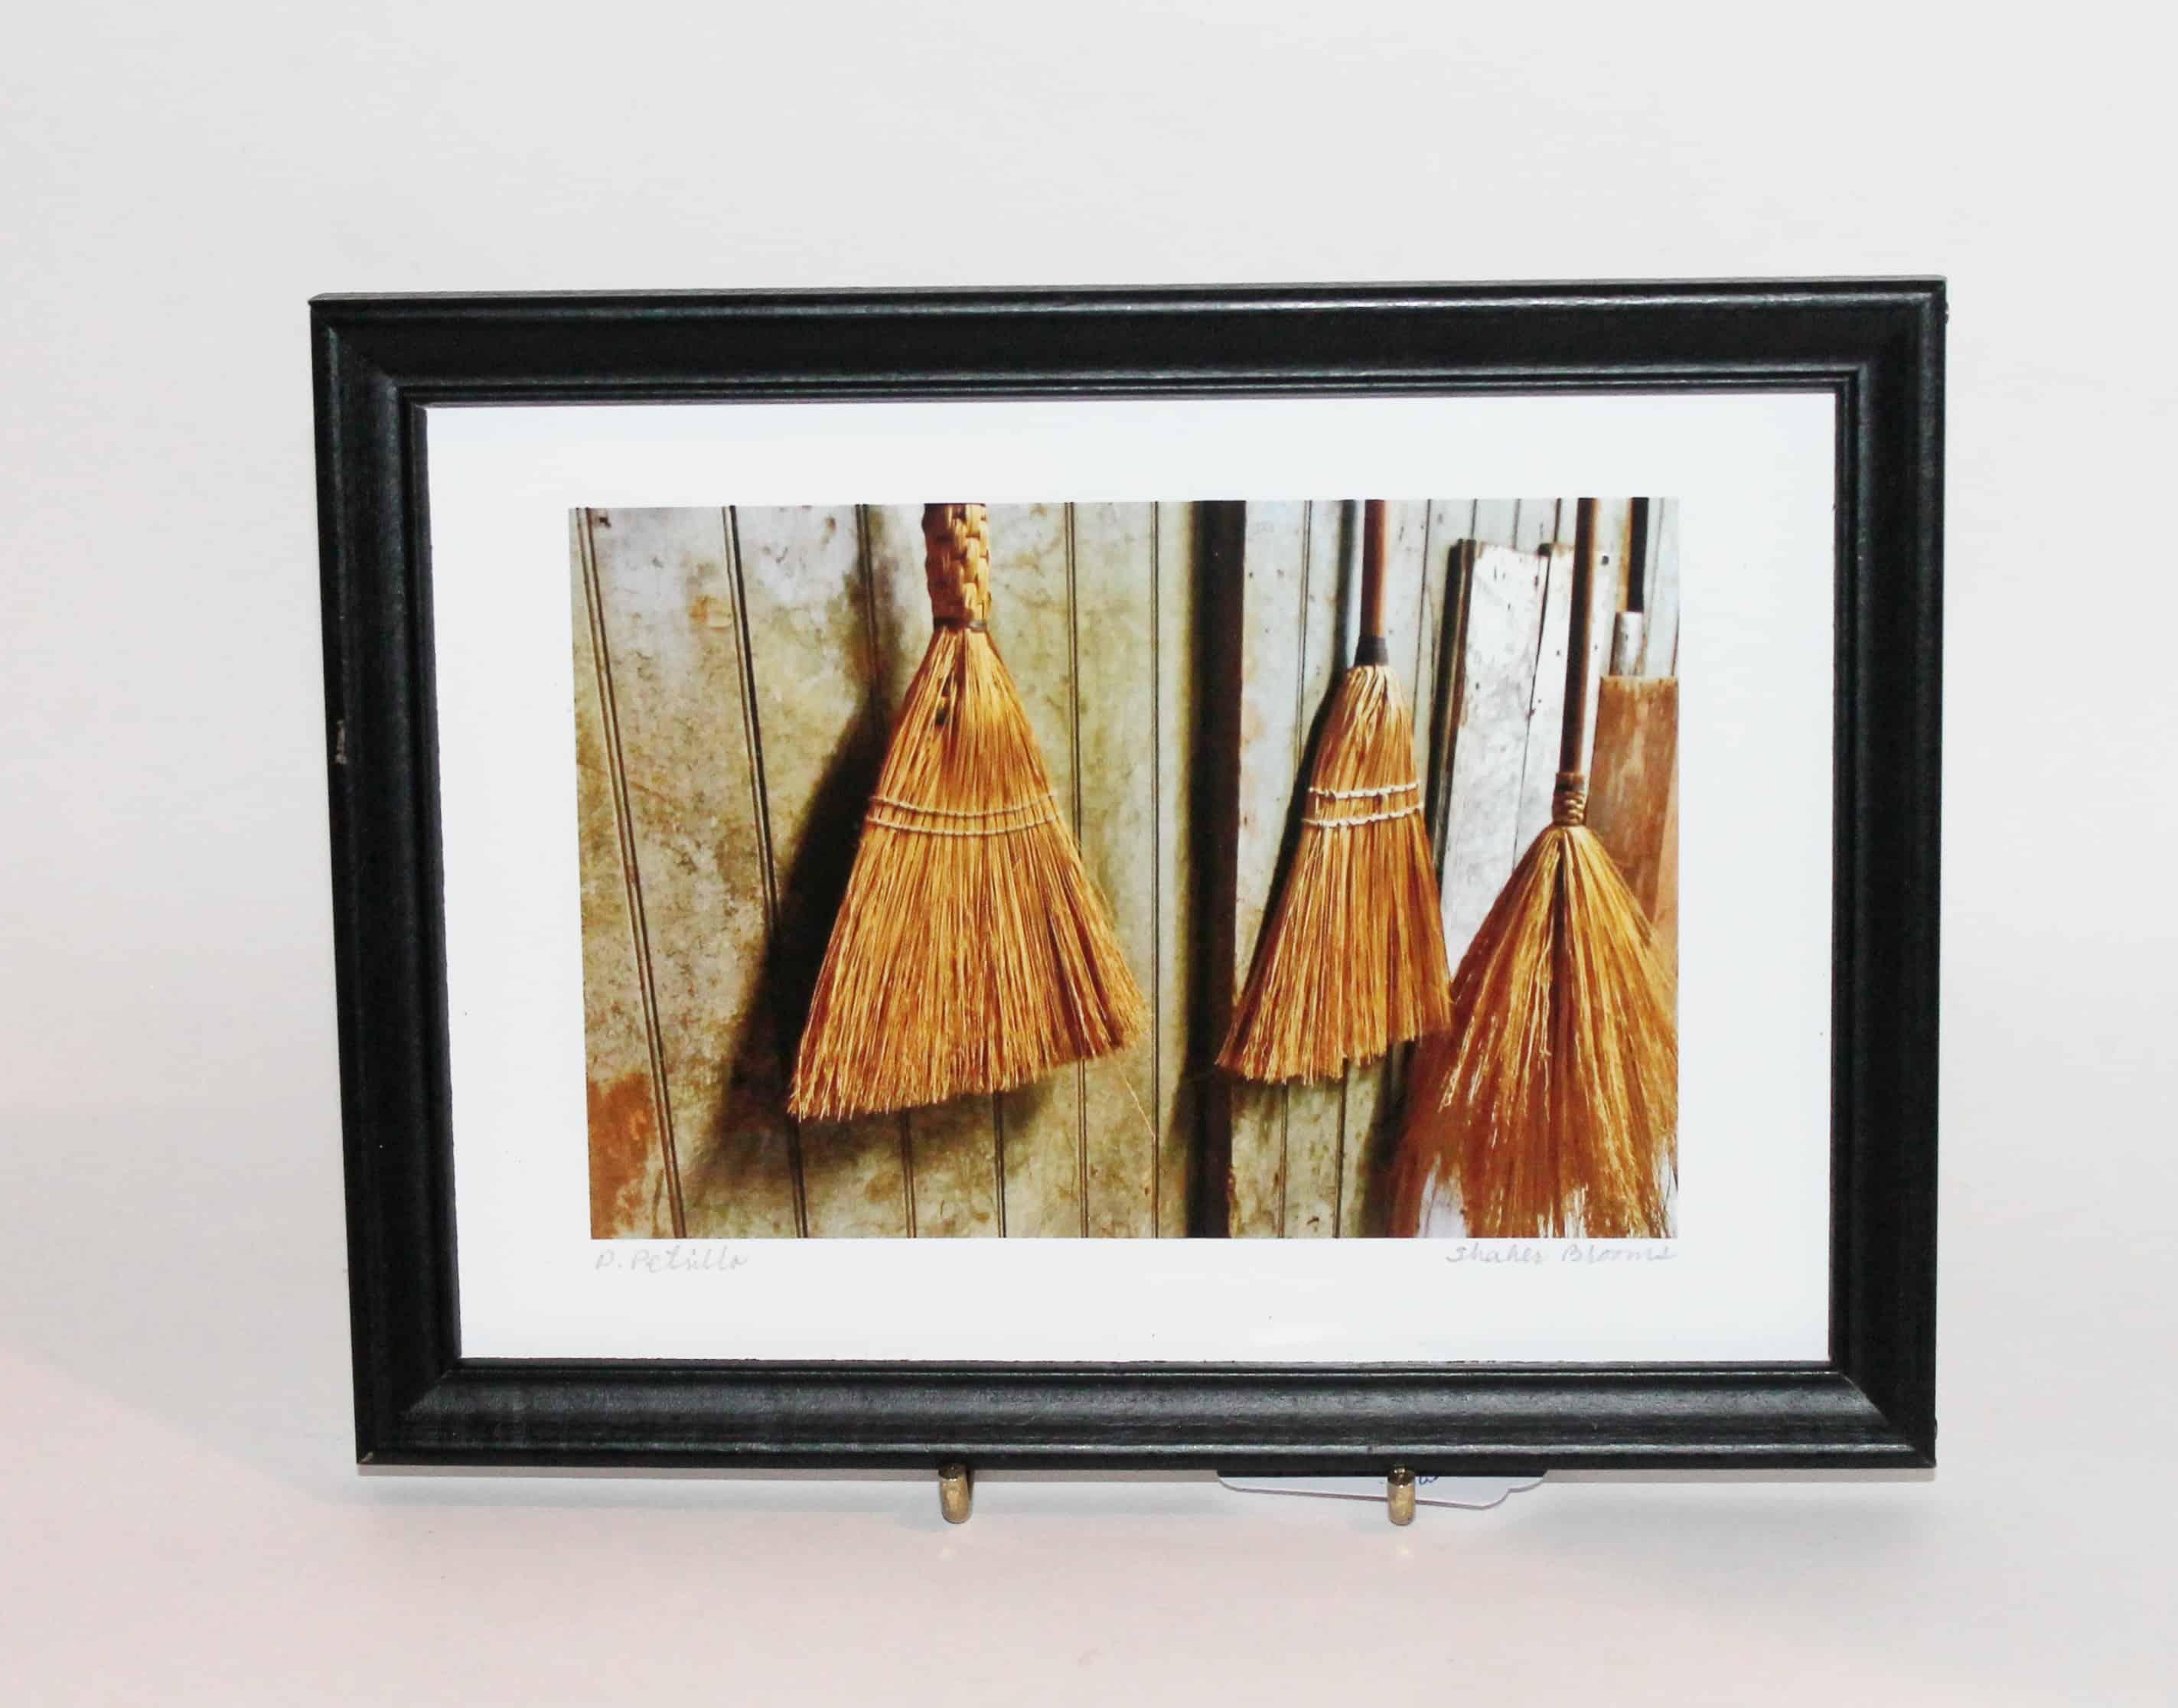 Shaker brooms